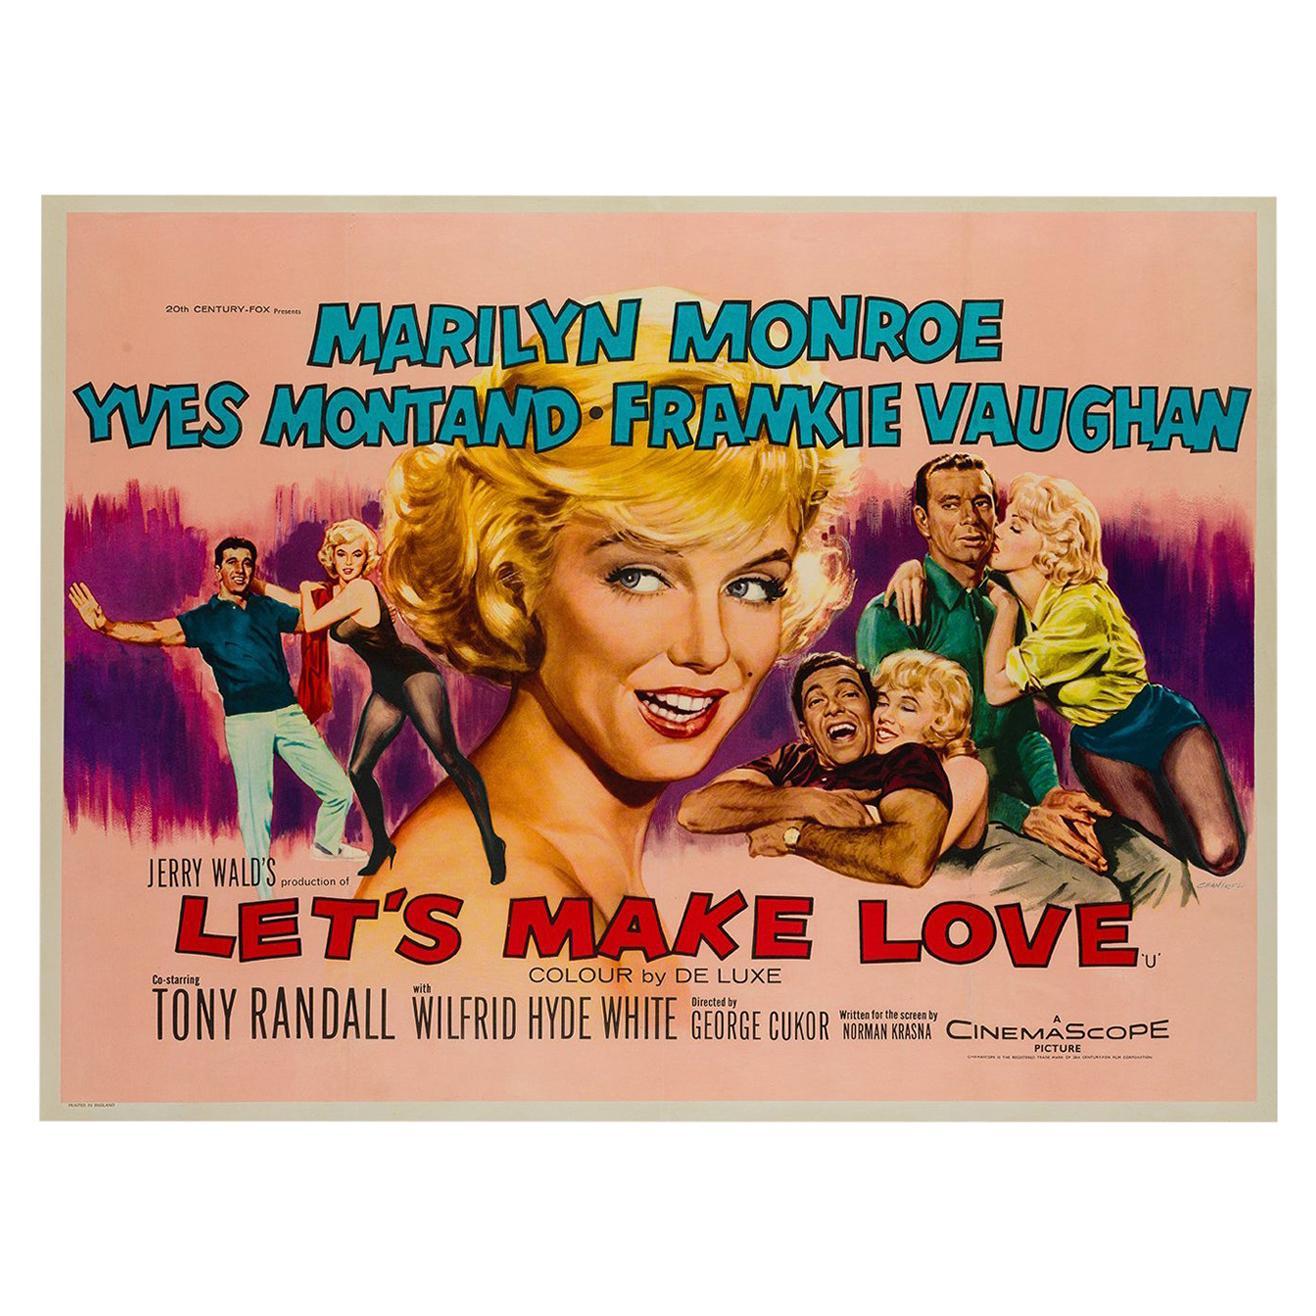 Let's Make Love Original UK Film Poster, Tom Chantrell, 1960